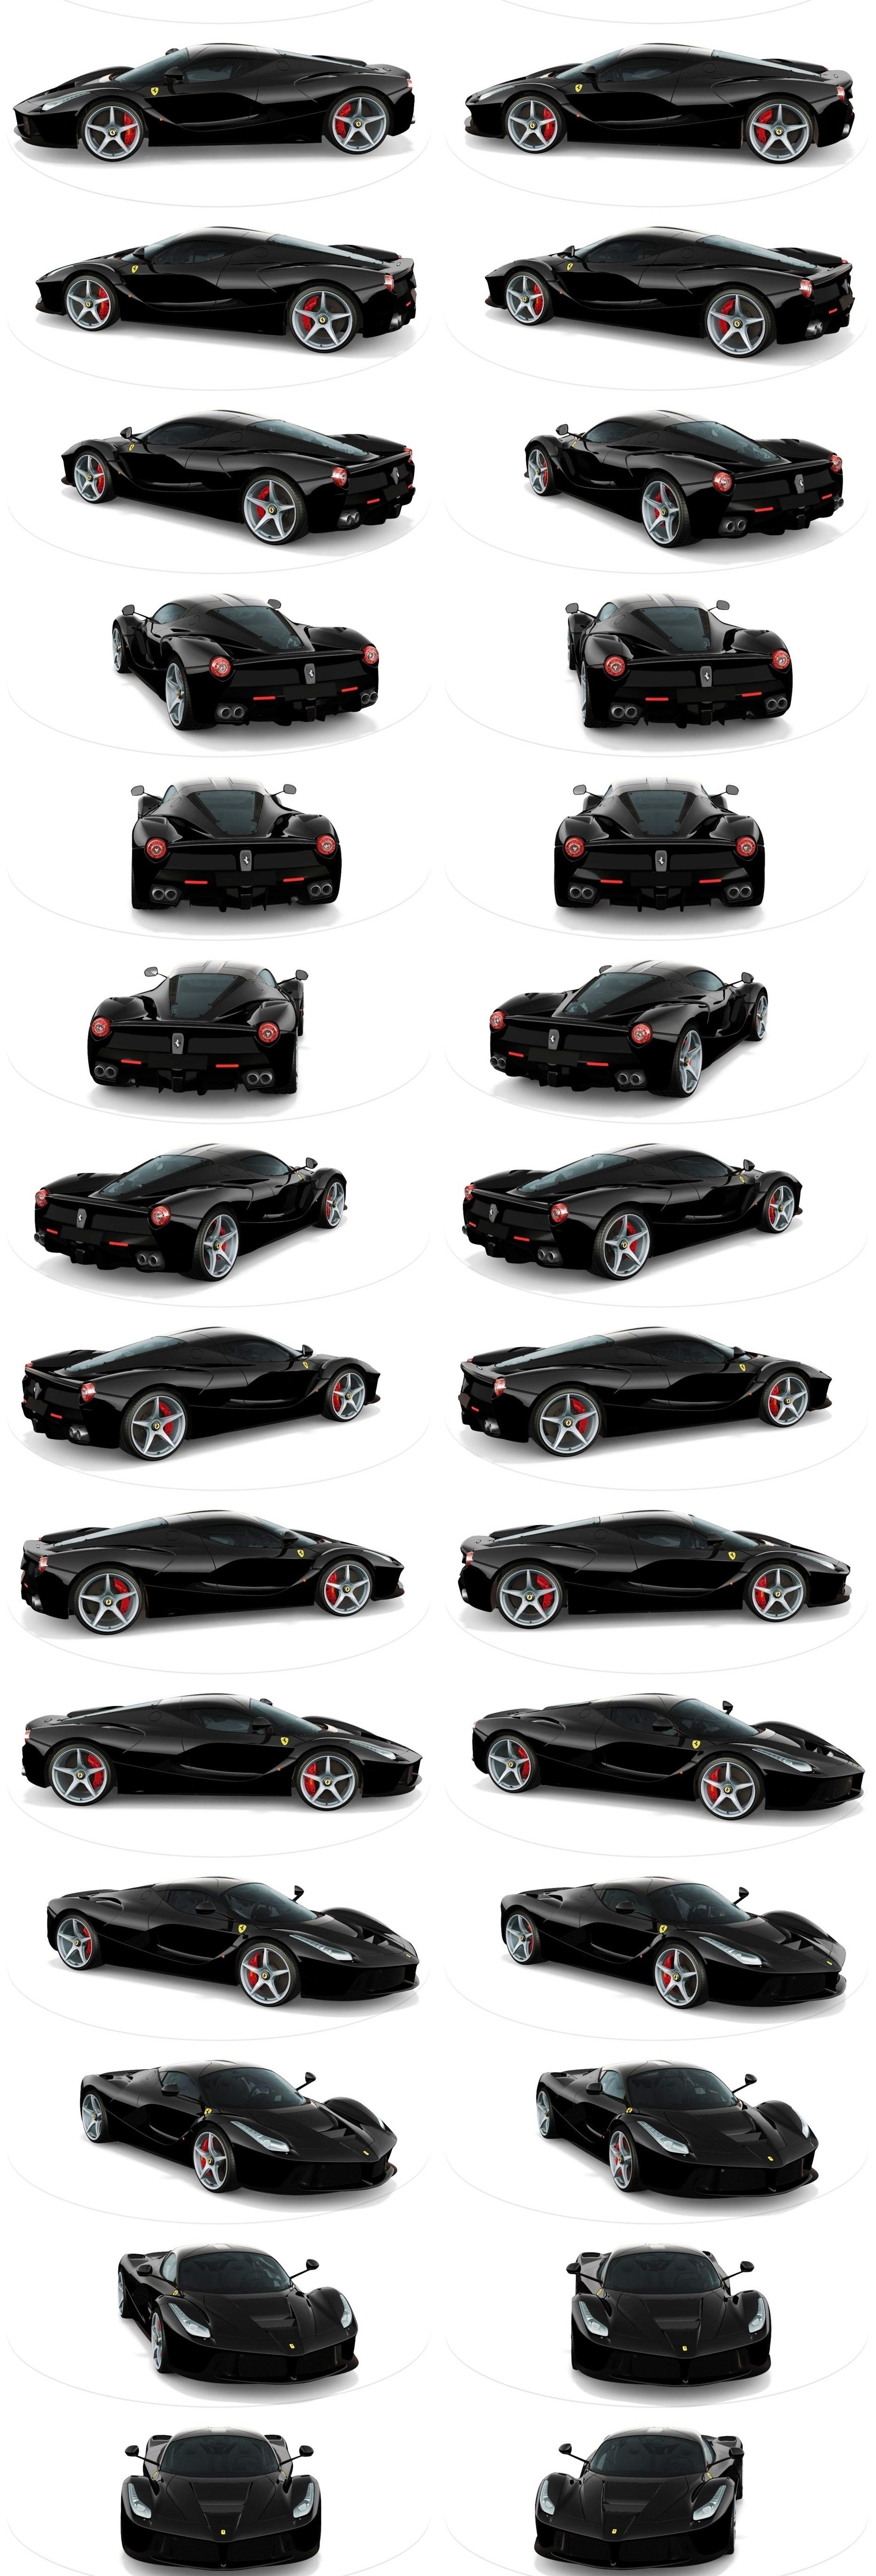 Laferrari Roadster Vs Mclaren P1 Spider 3 Car Revs Daily